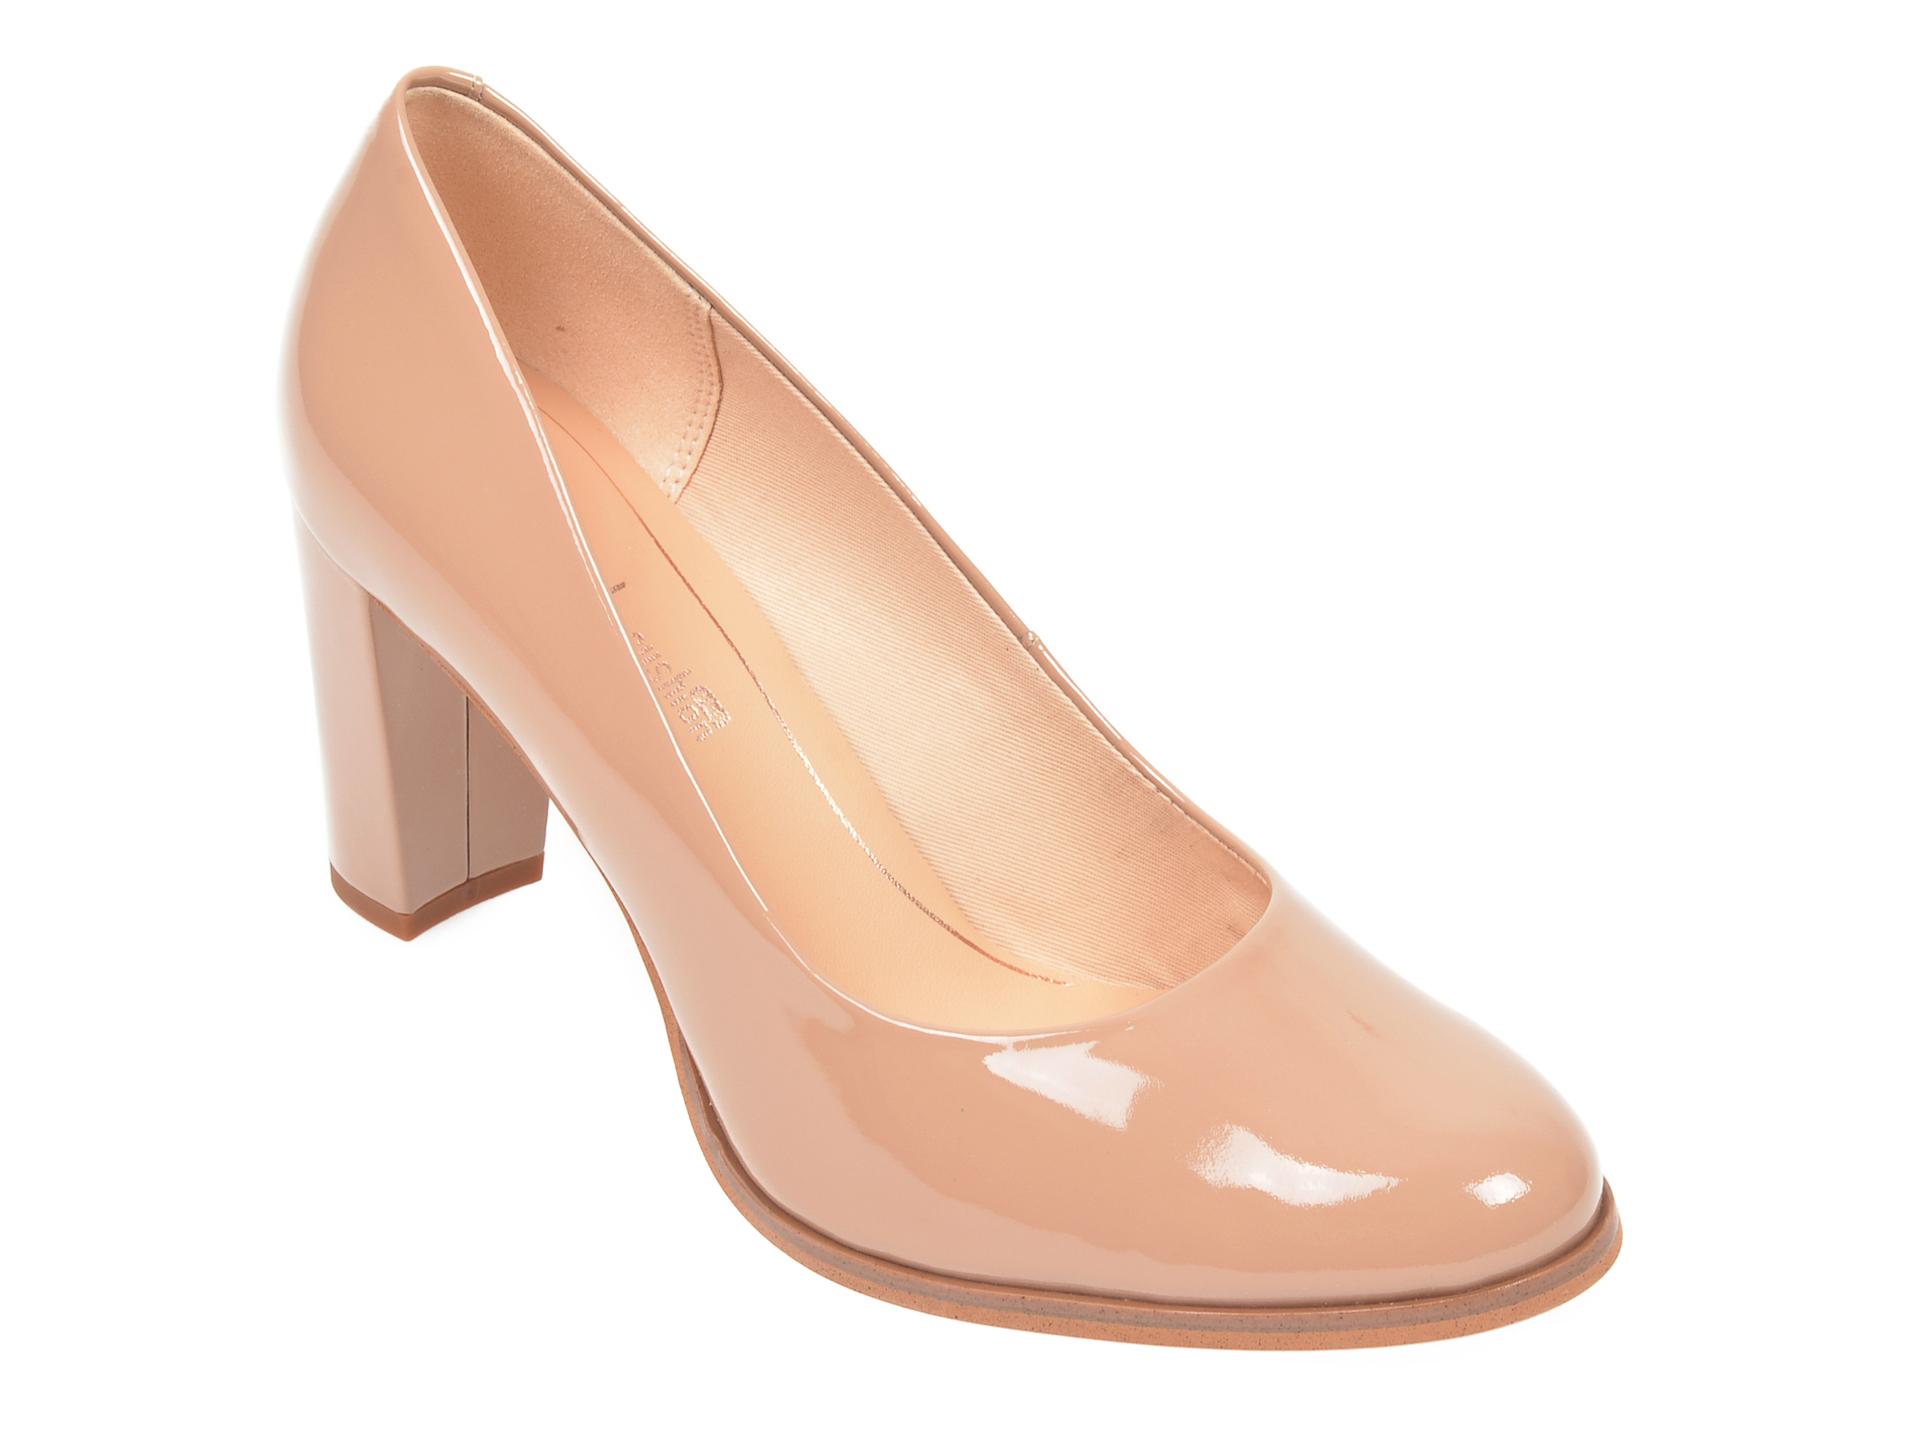 Pantofi CLARKS nude, Kaylin Cara, din piele naturala lacuita imagine